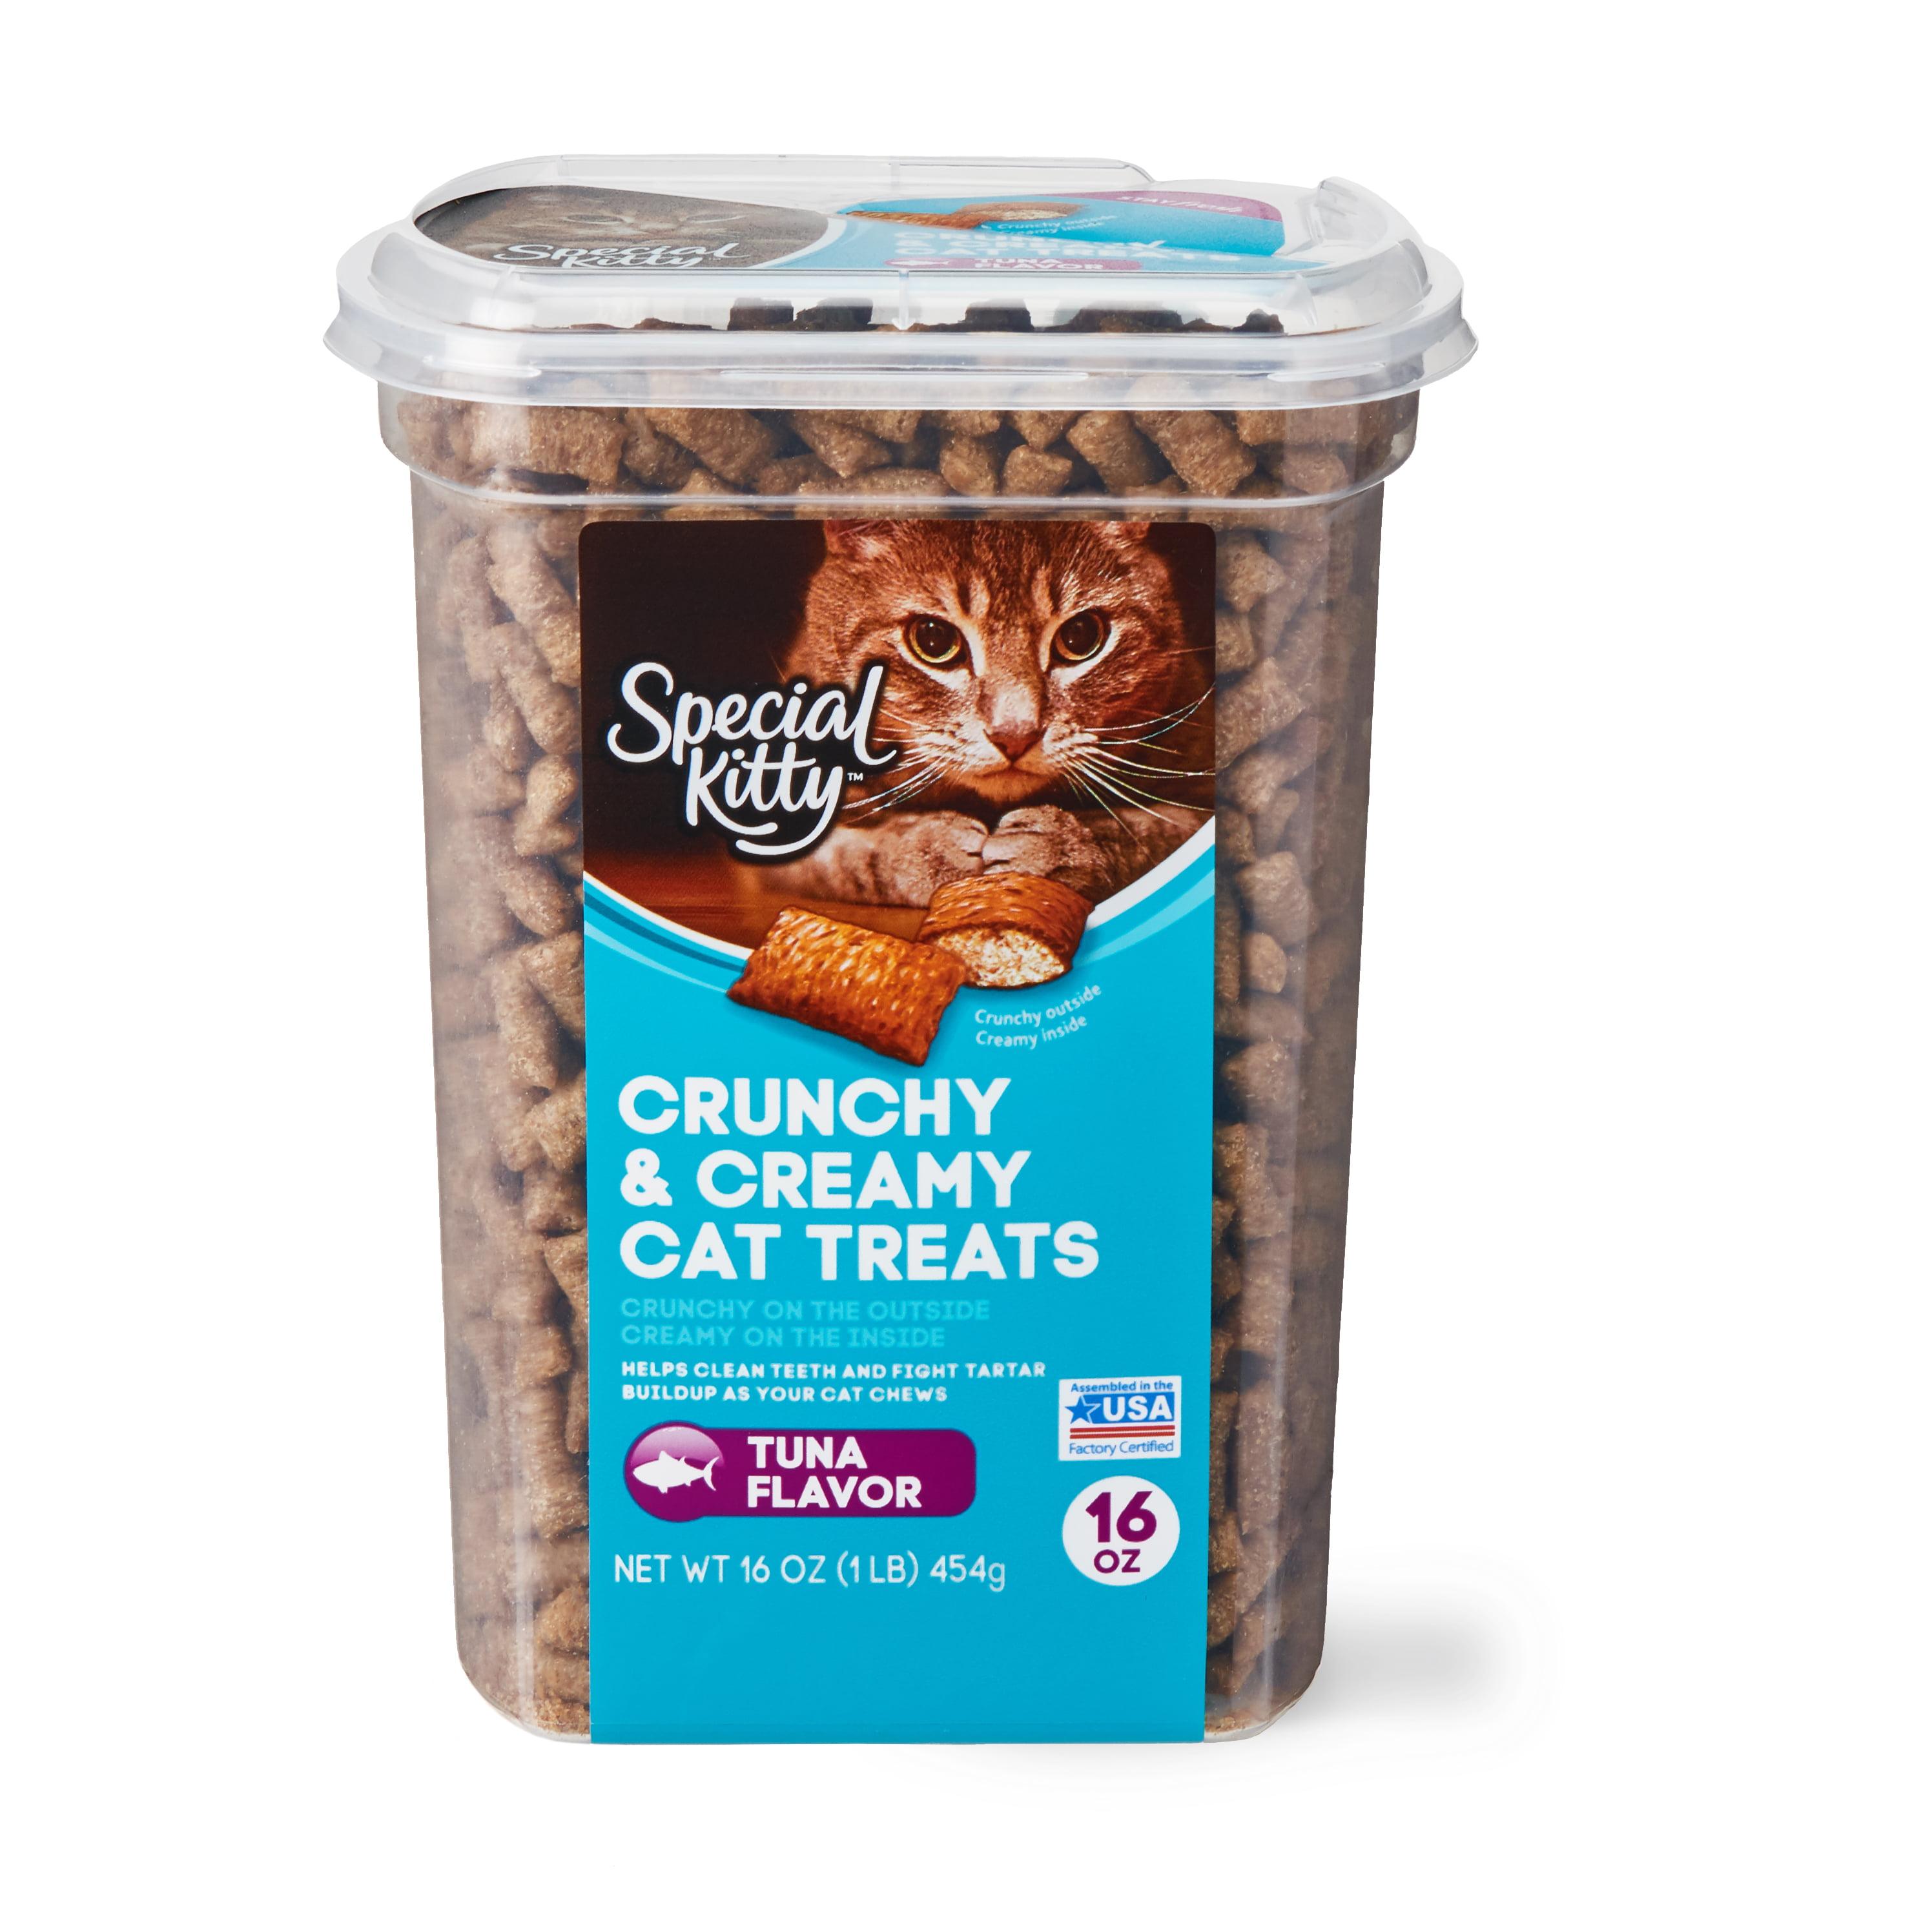 Special Kitty Crunchy & Creamy Cat Treats, Tuna Flavor, 16 oz